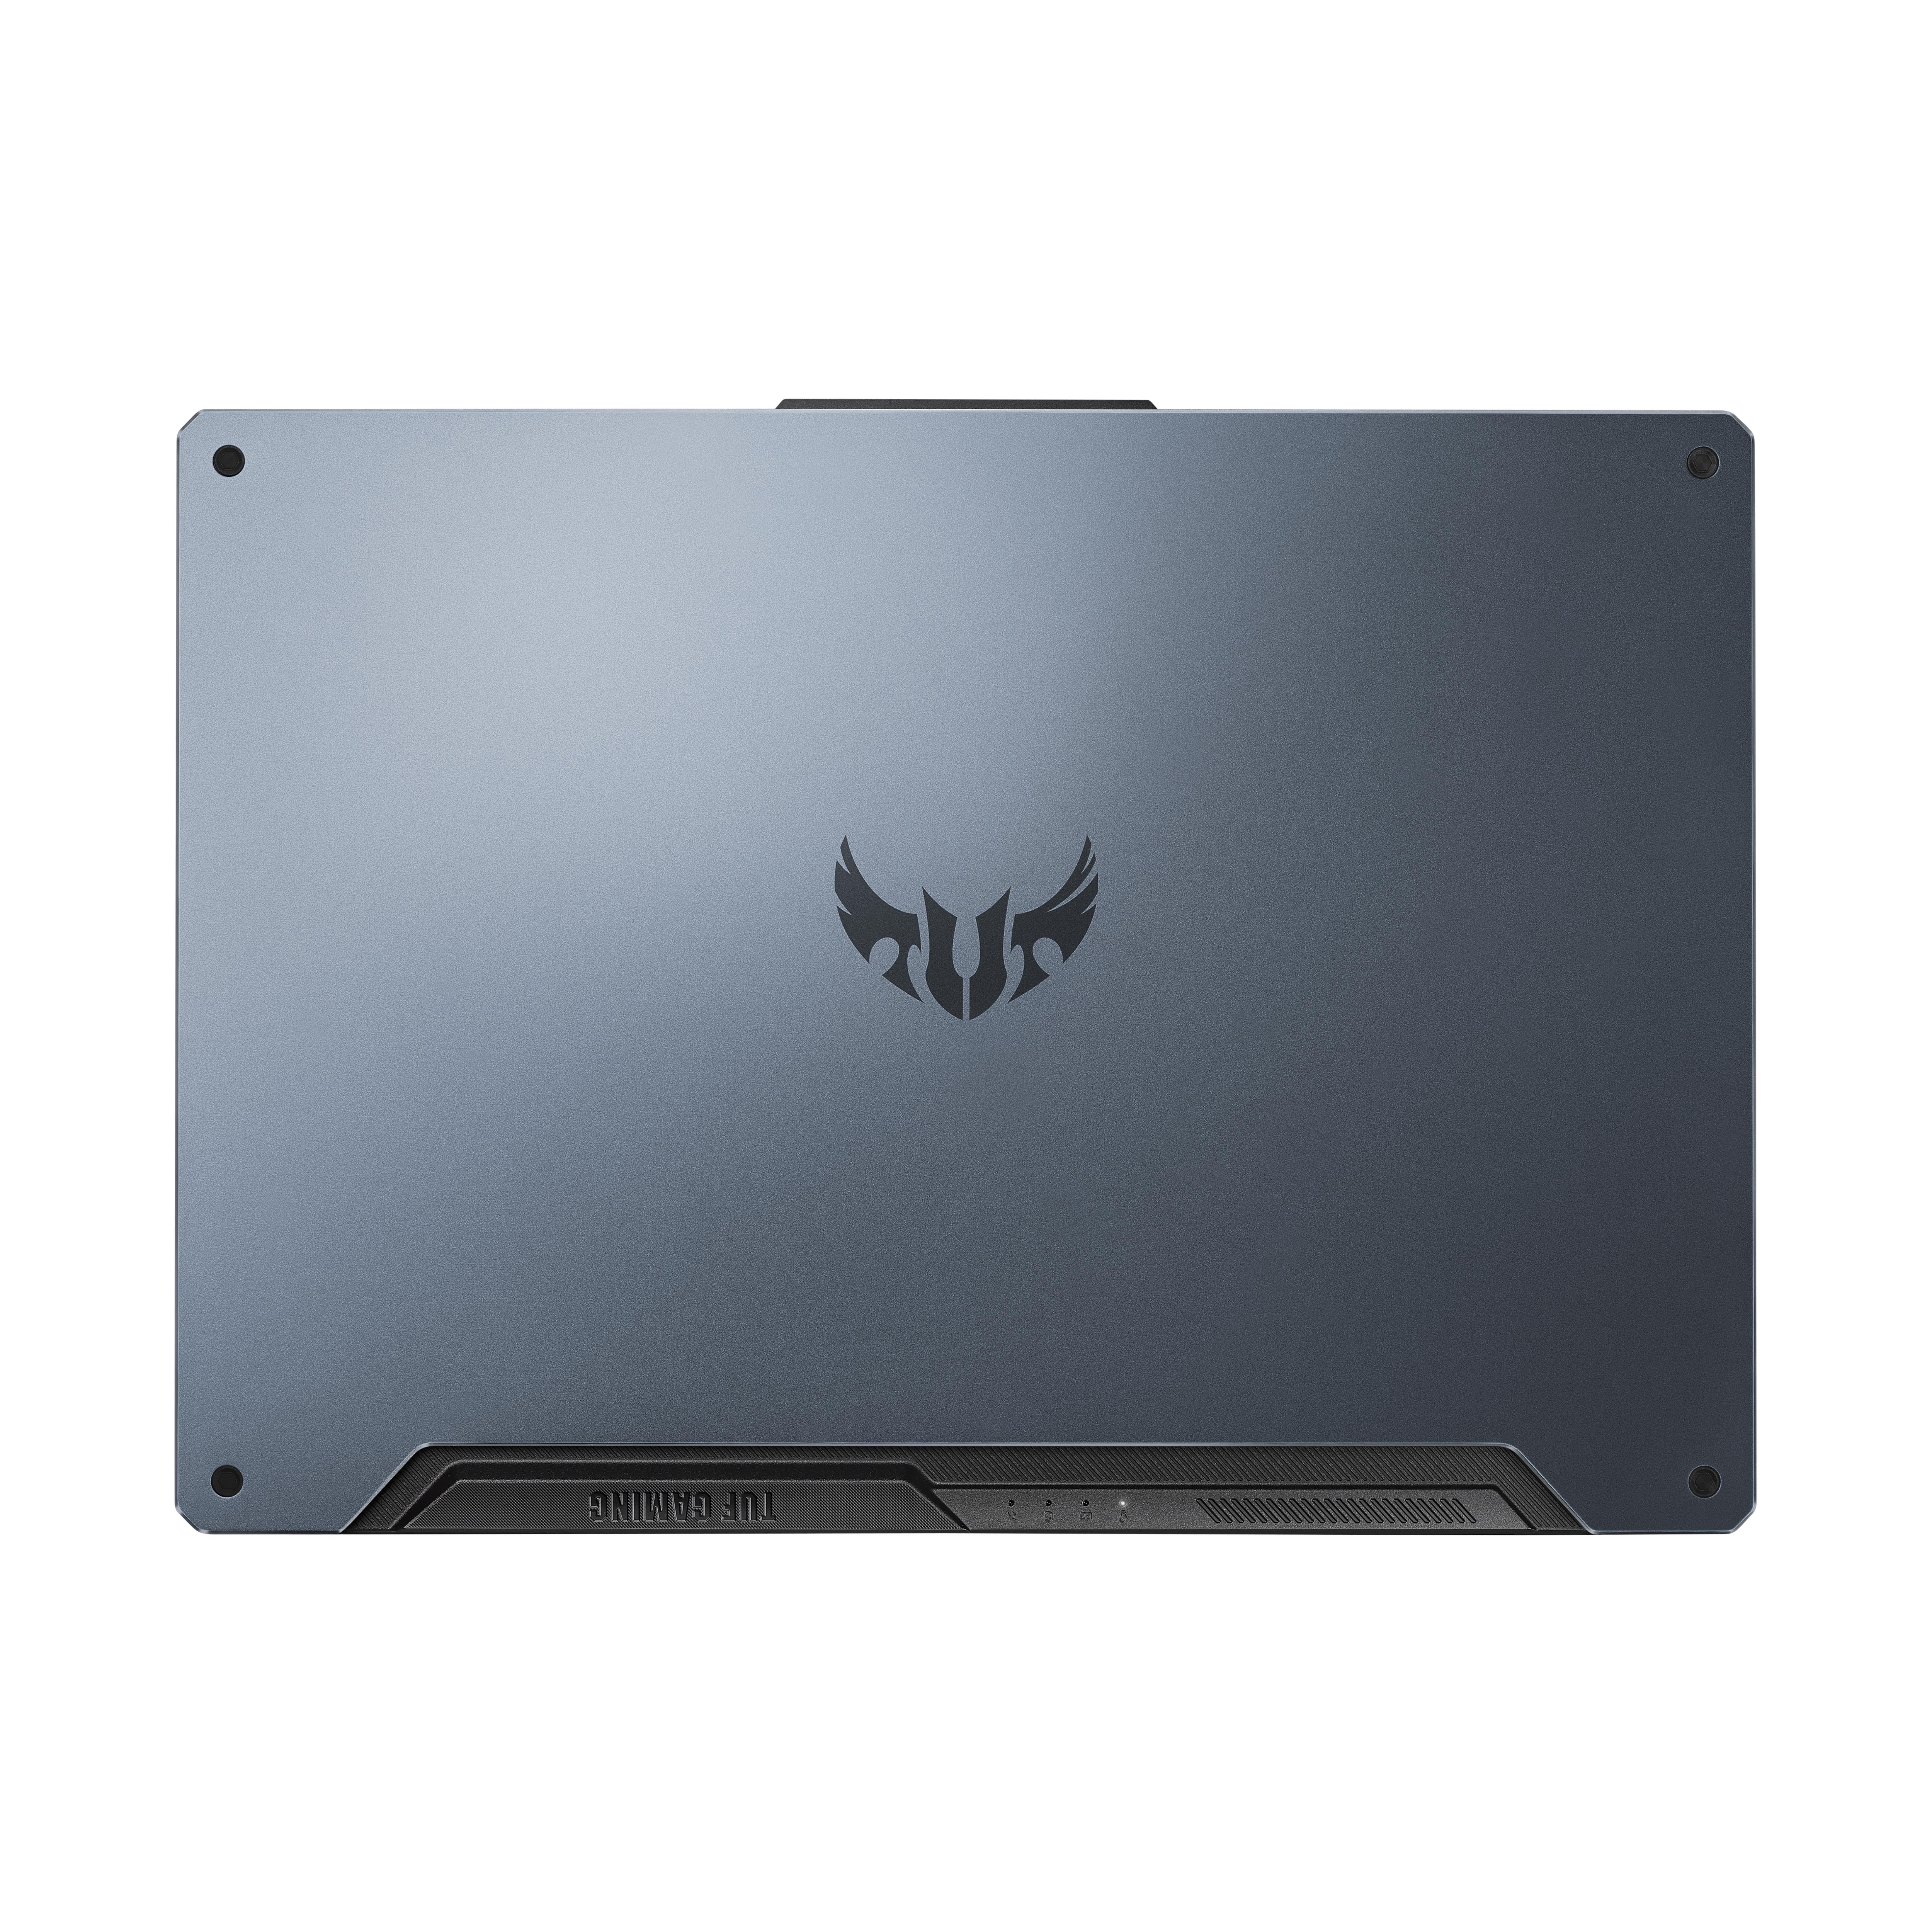 Asus  TUF Gaming FX506LI-HN096T Fortress Gray